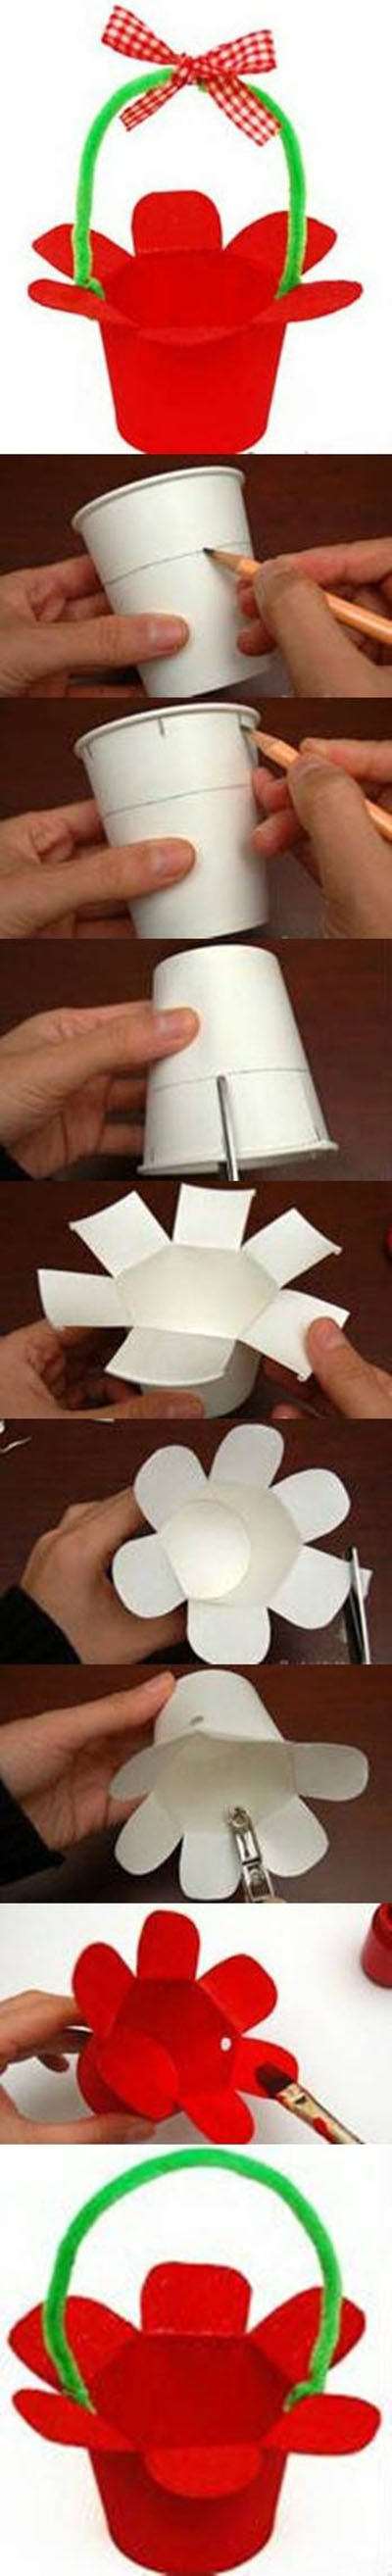 19  DIY Paper Cup Basket6d3